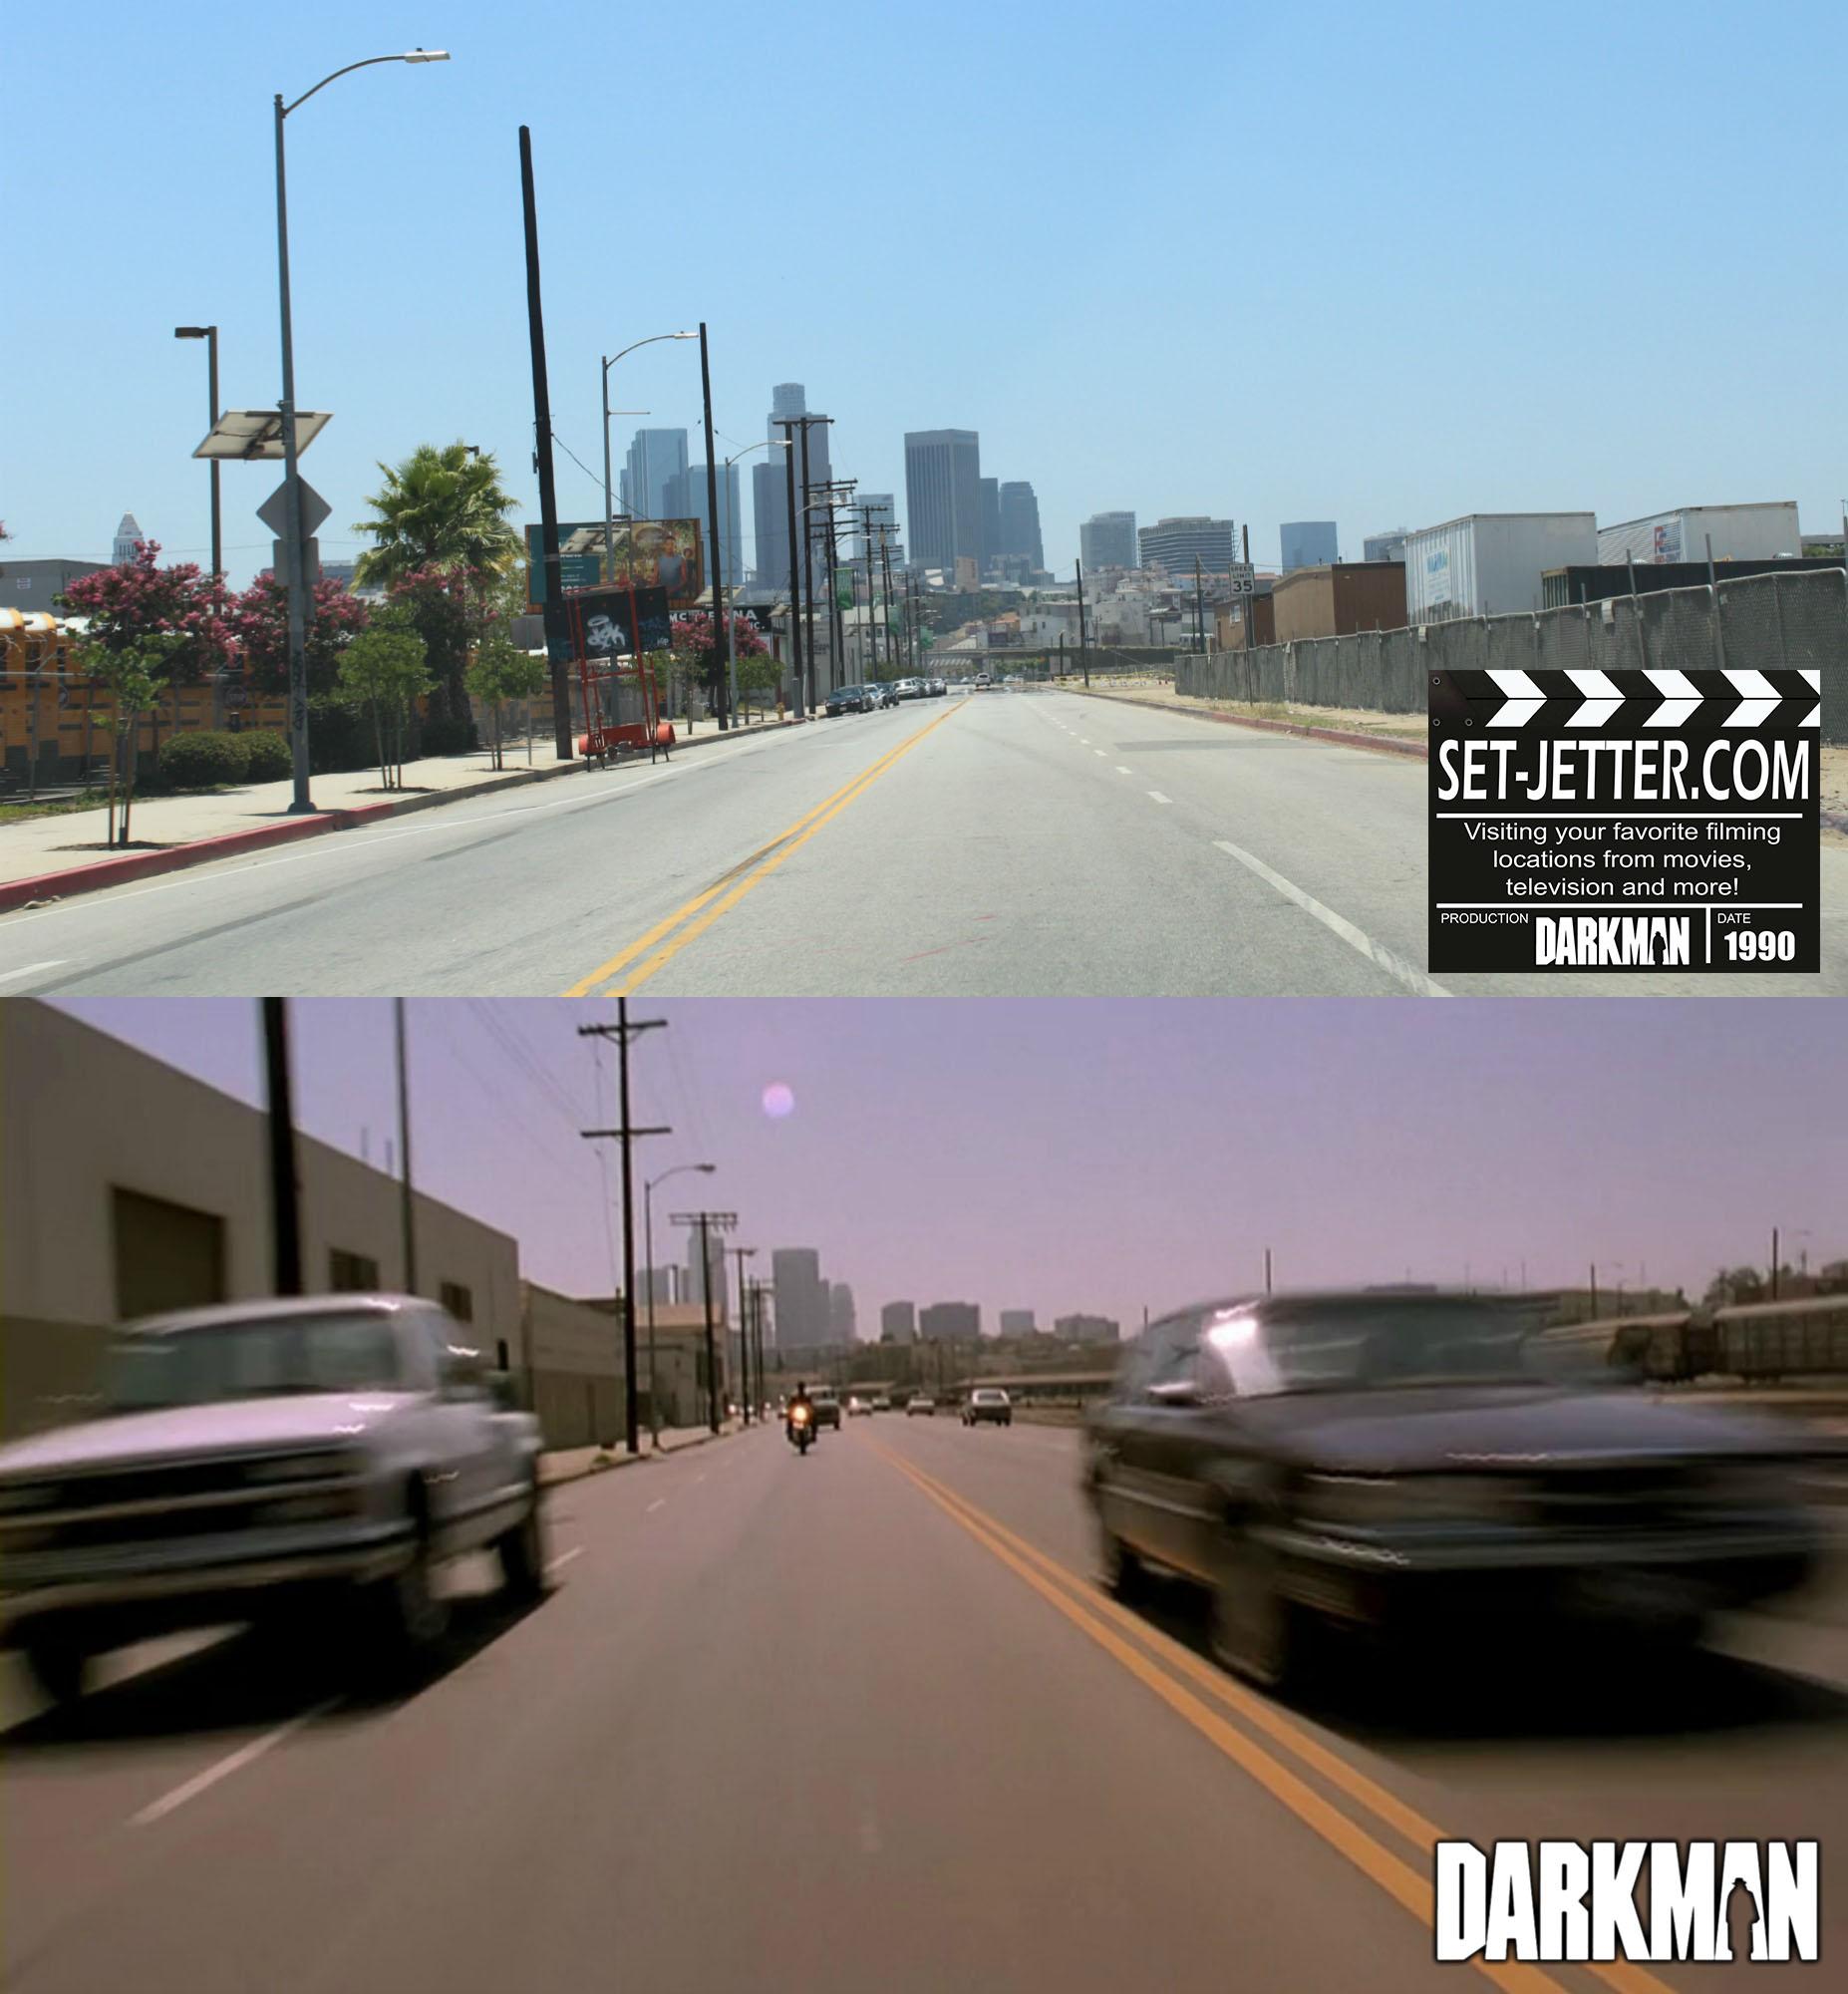 Darkman 25.jpg